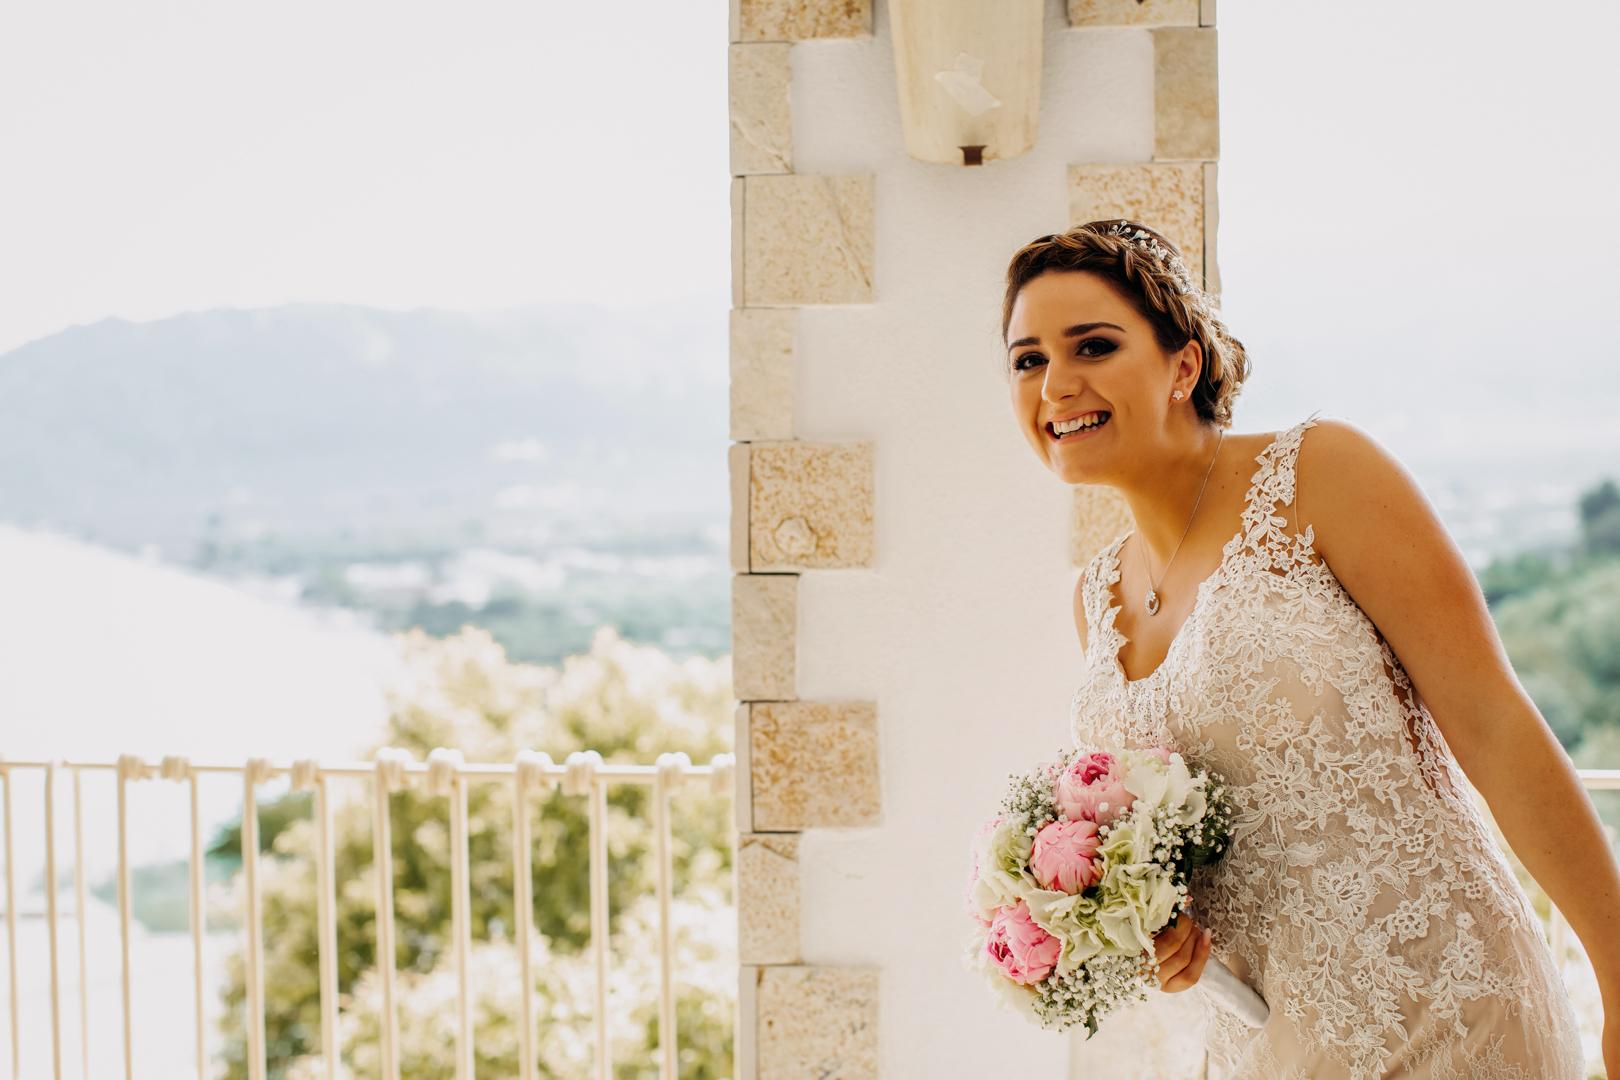 20 sposa-bride-wedding-gargano-gianni-lepore-fotografo